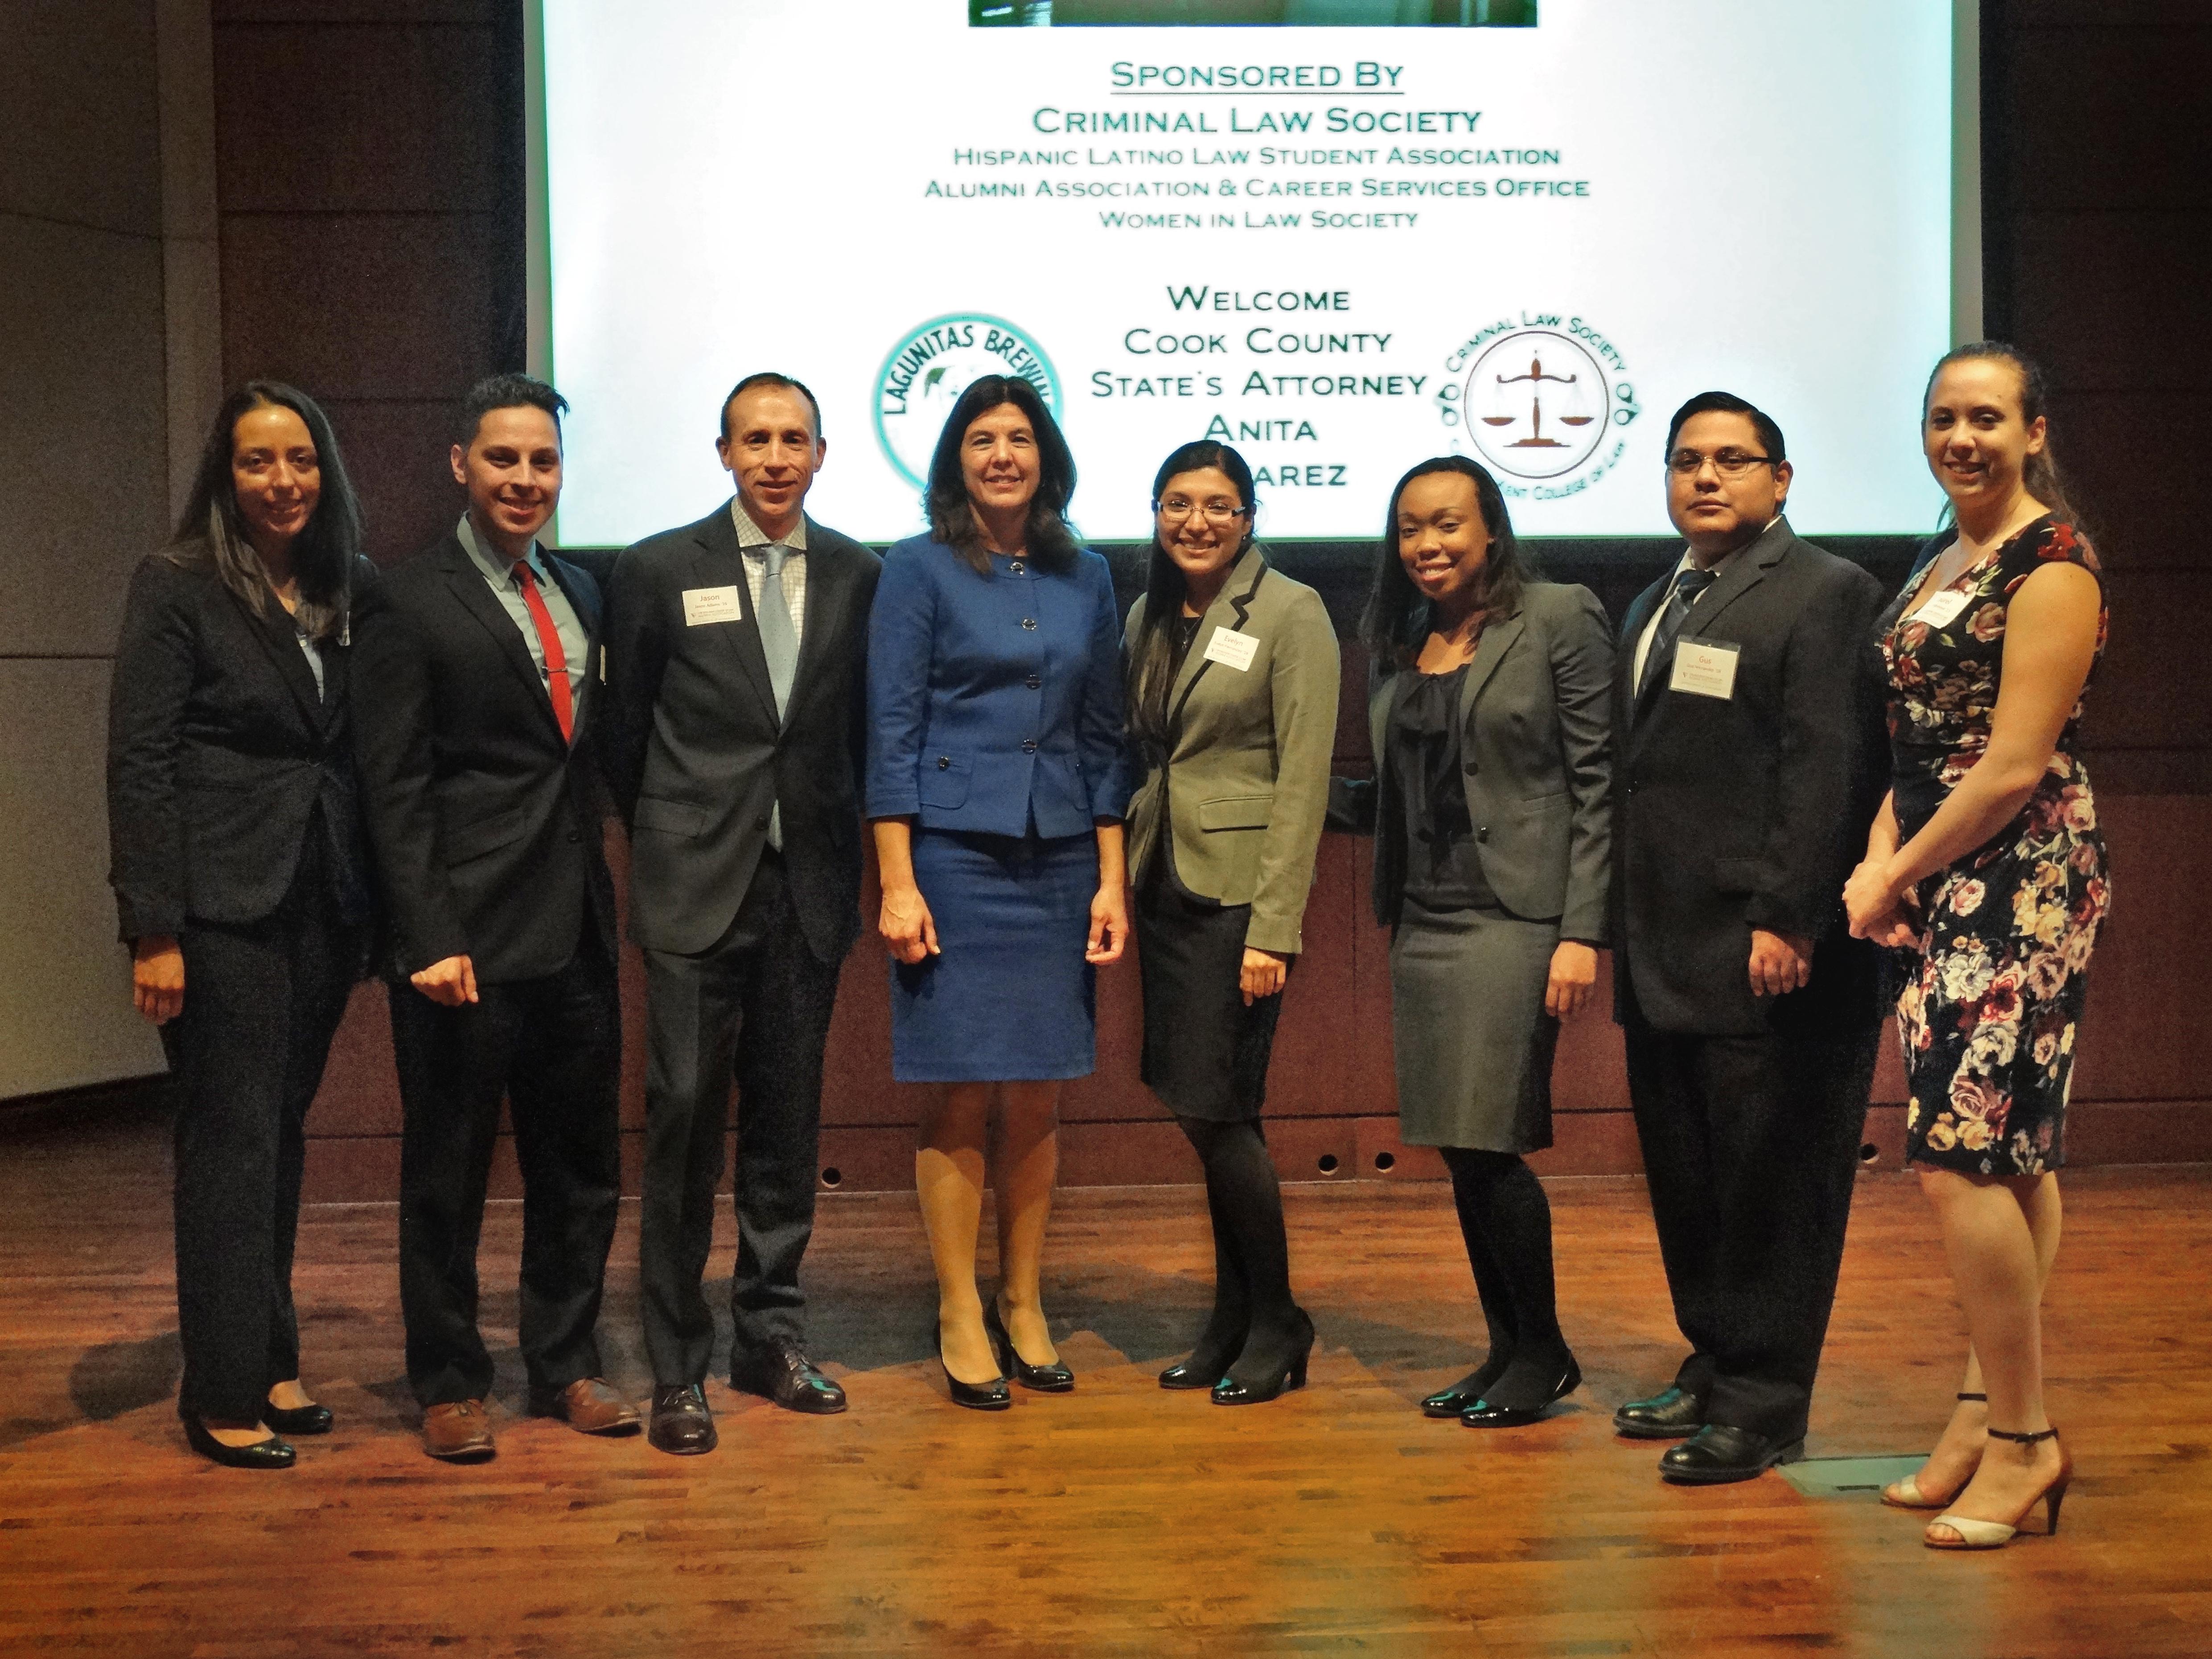 An Evening with Anita Alvarez: An Up-Close Look At The Criminal Law Profession